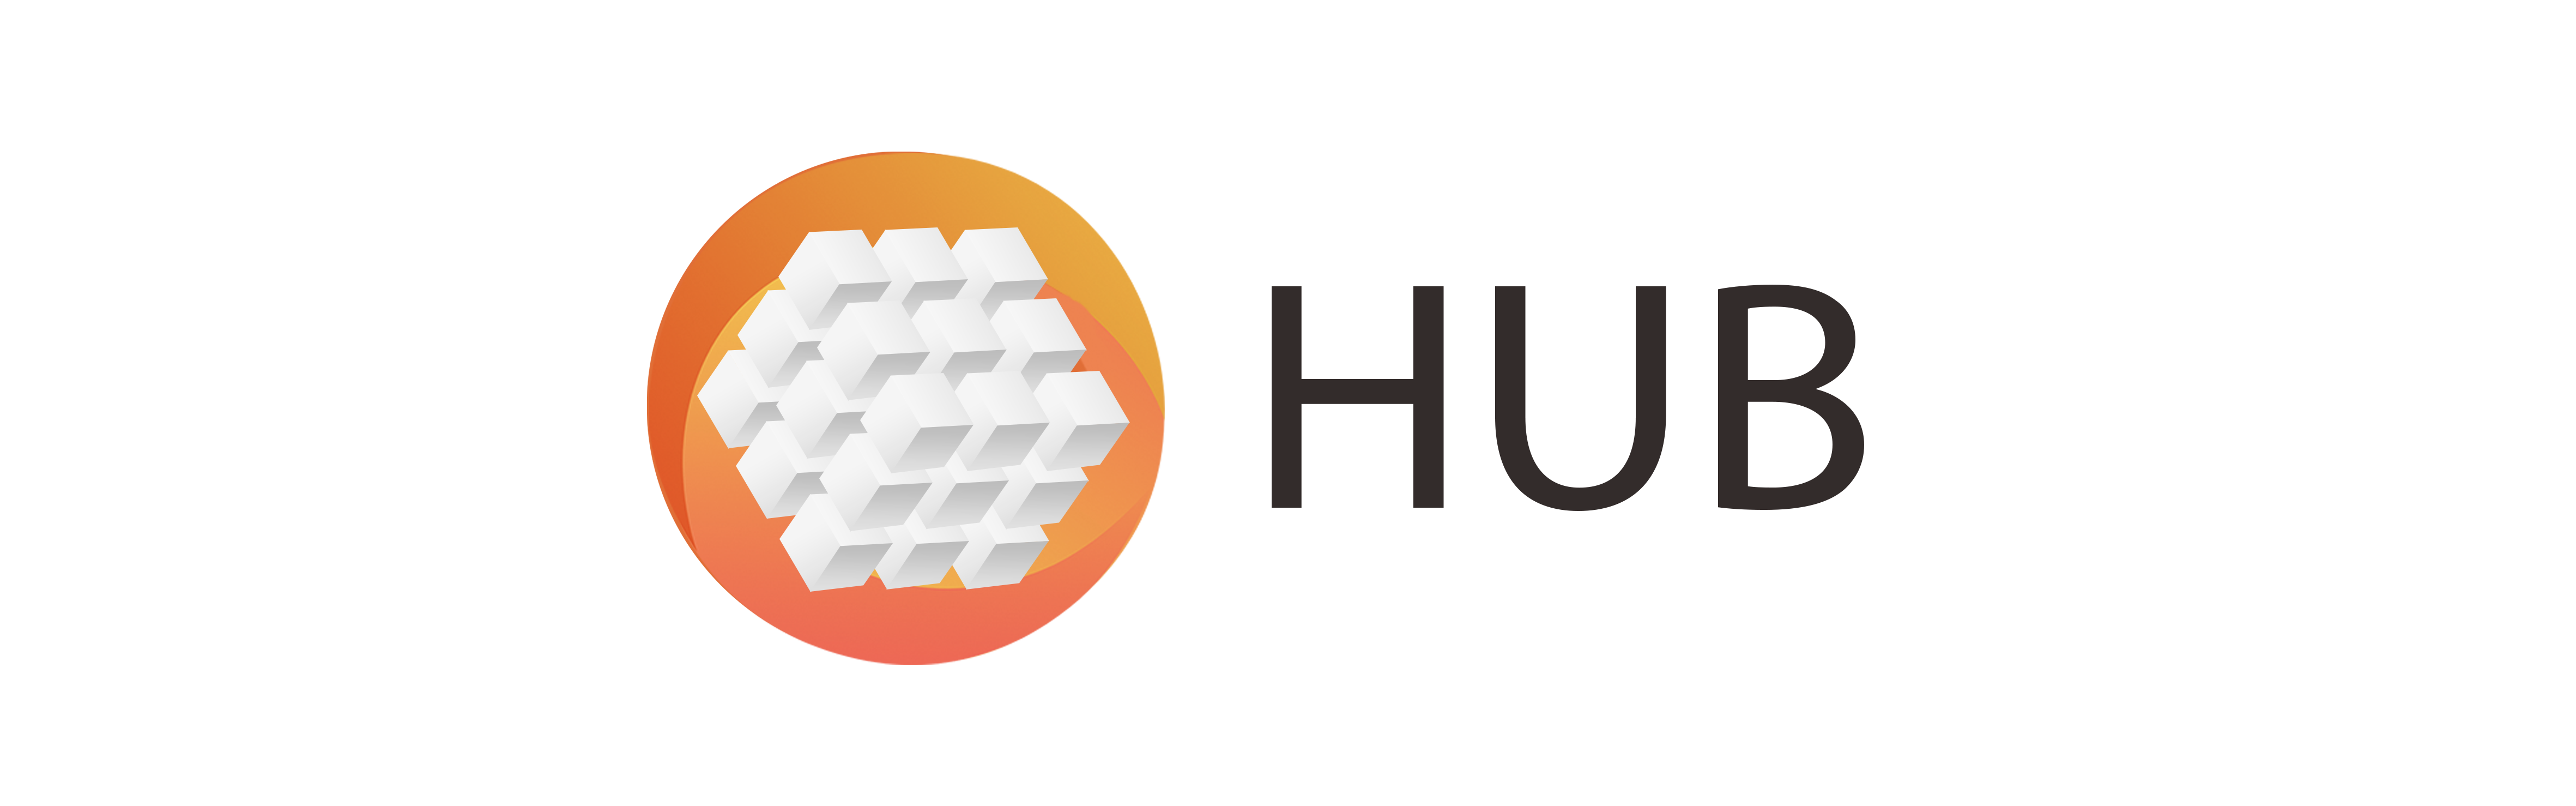 https://raw.githubusercontent.com/snarkai/Hub/master/docs/logo/hub_logo.png